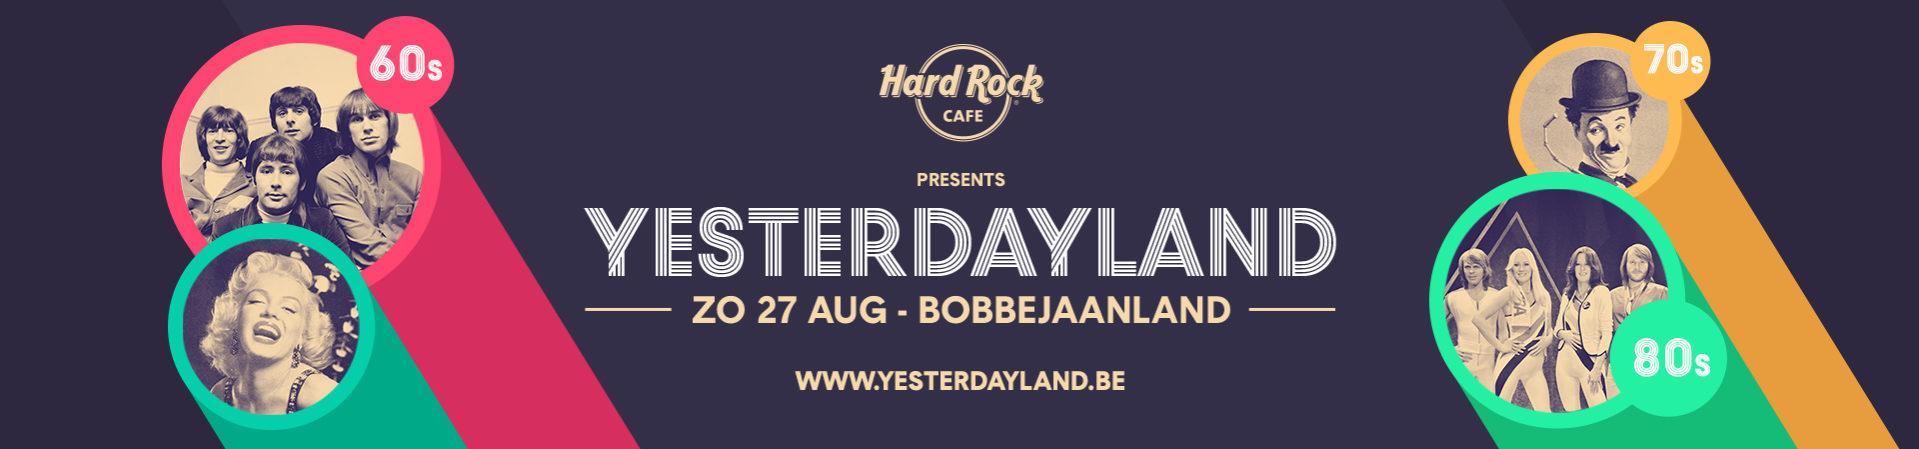 Yesterdayland Bobbejaanland Ticketpoint